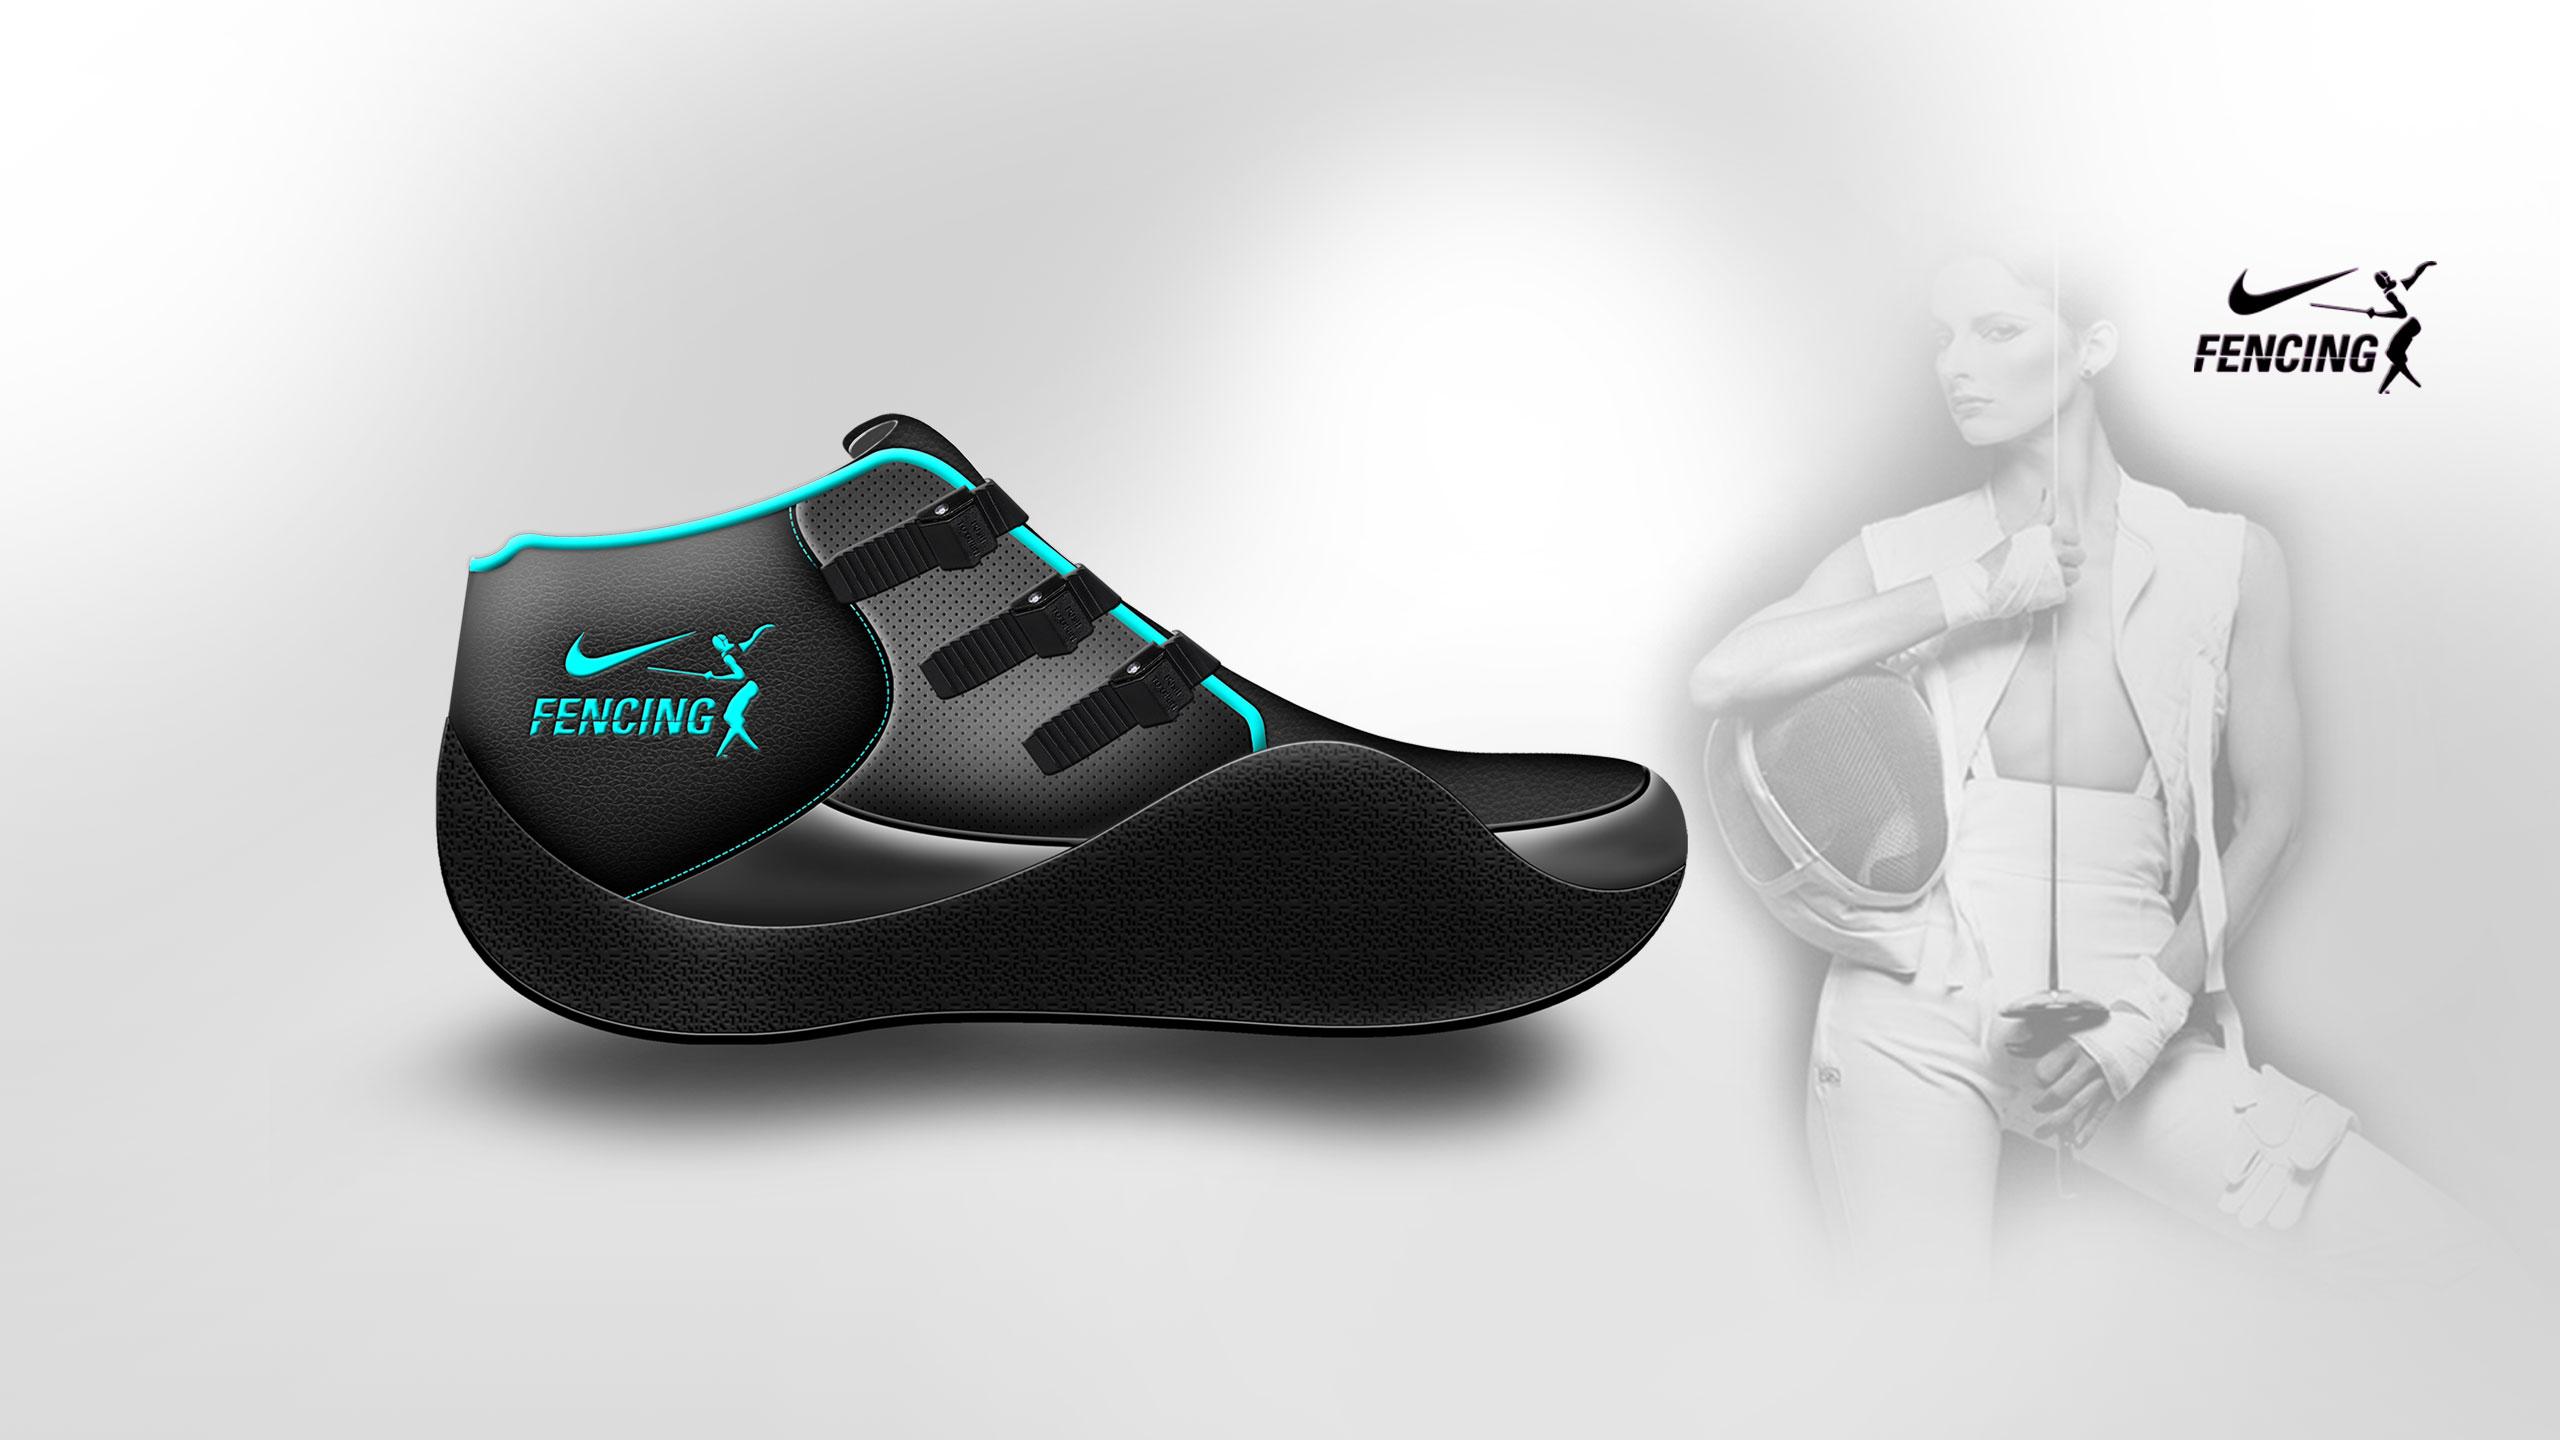 Fencing Shoes – Stylish | Merve Karamete – Industrial Product Designs Portfolio